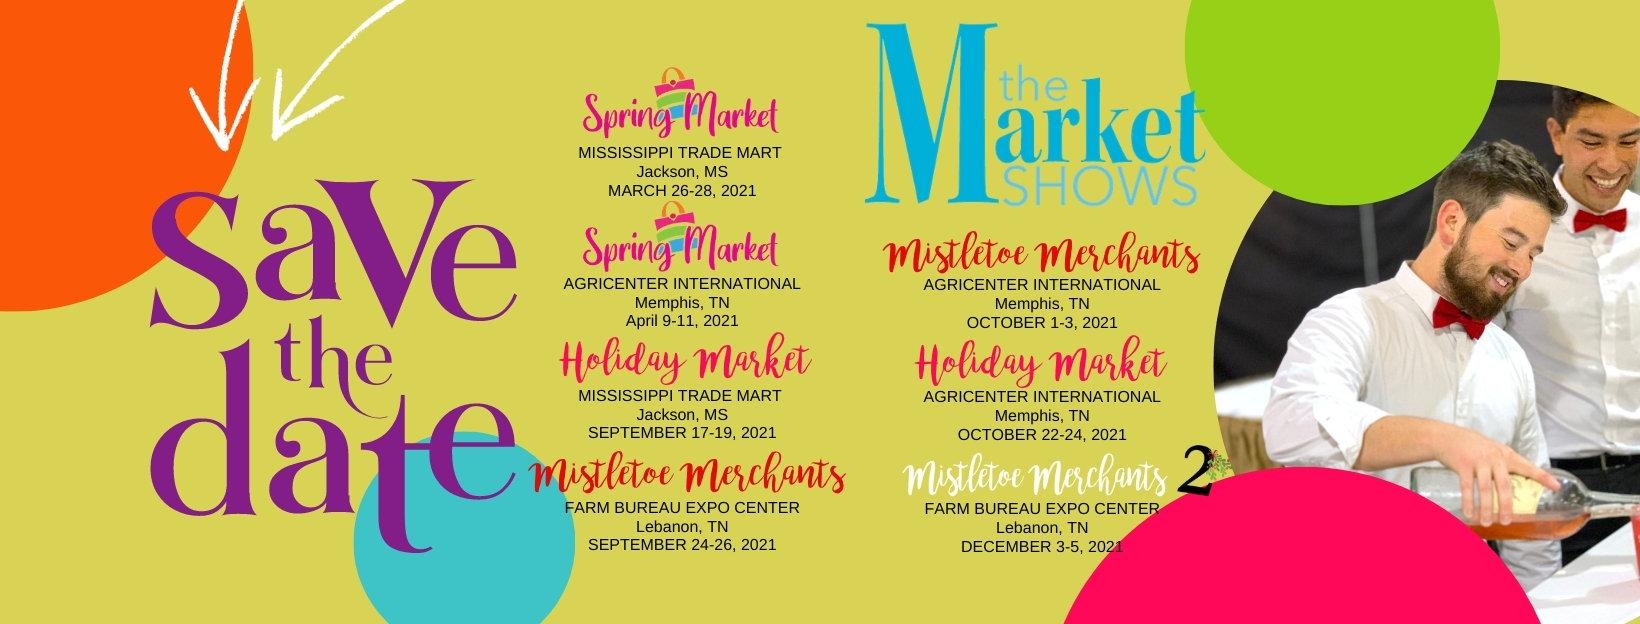 Market Show Facebook Cover (1).jpg